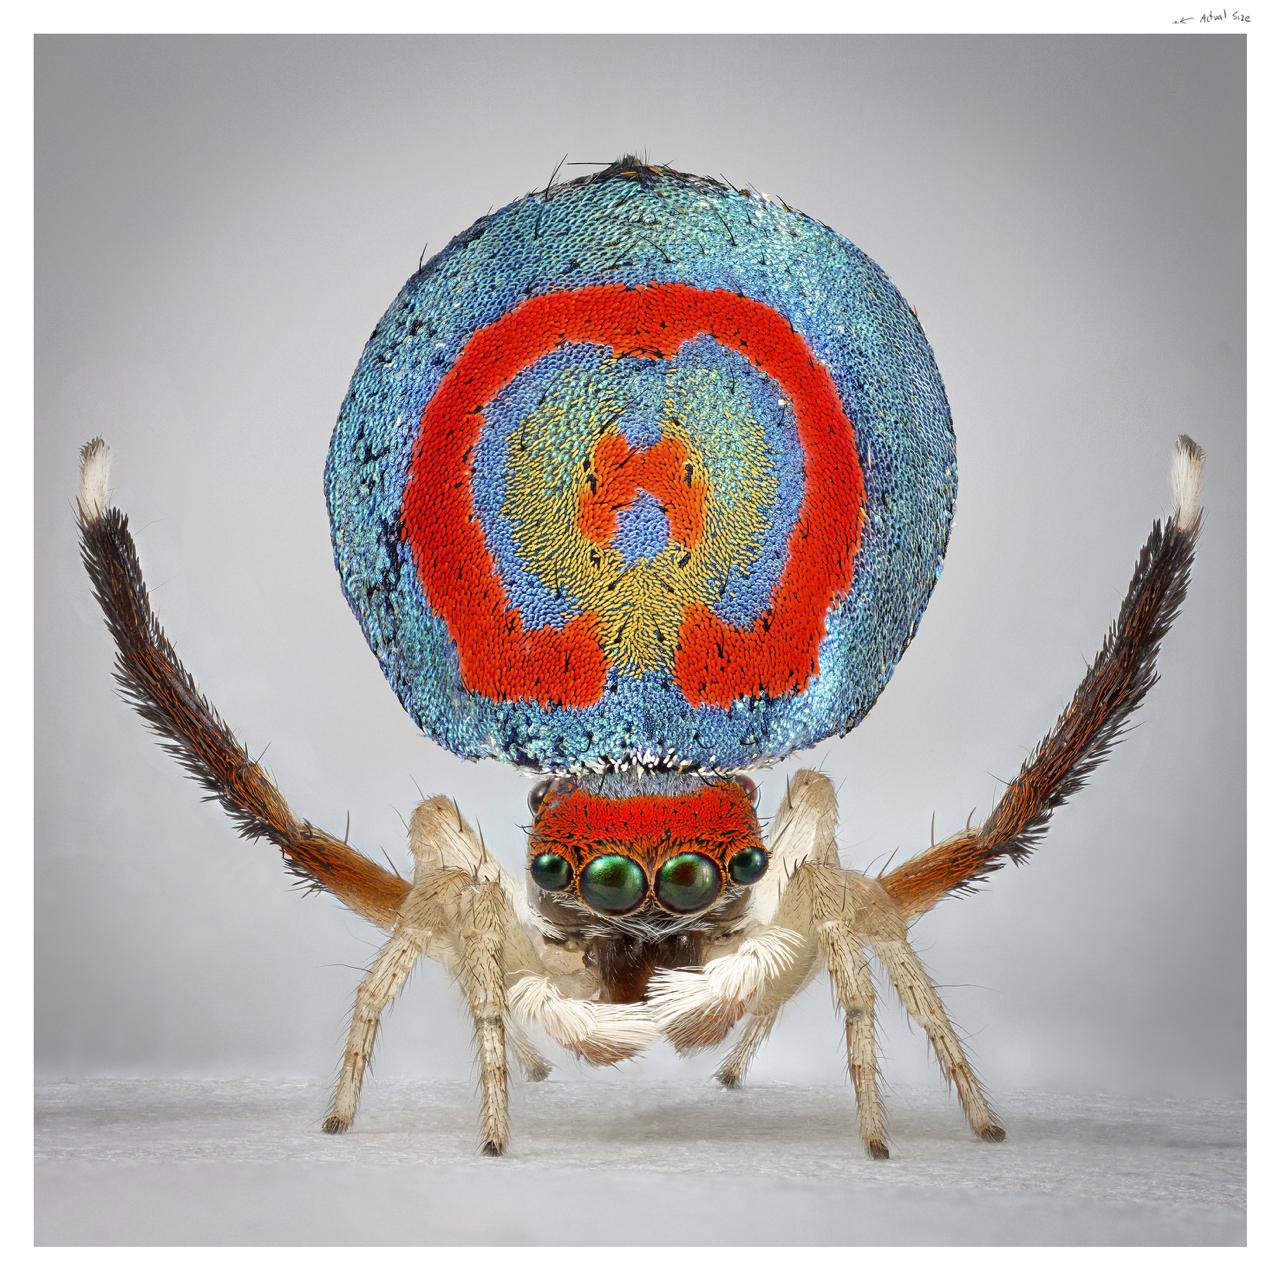 Maria Fernanda Cardoso, Male peacock spider whole body, Maratus splendans #15, 1 Sep 2014, Rehead Lagoon. Images courtesy the artist and Sullivan+Strumpf